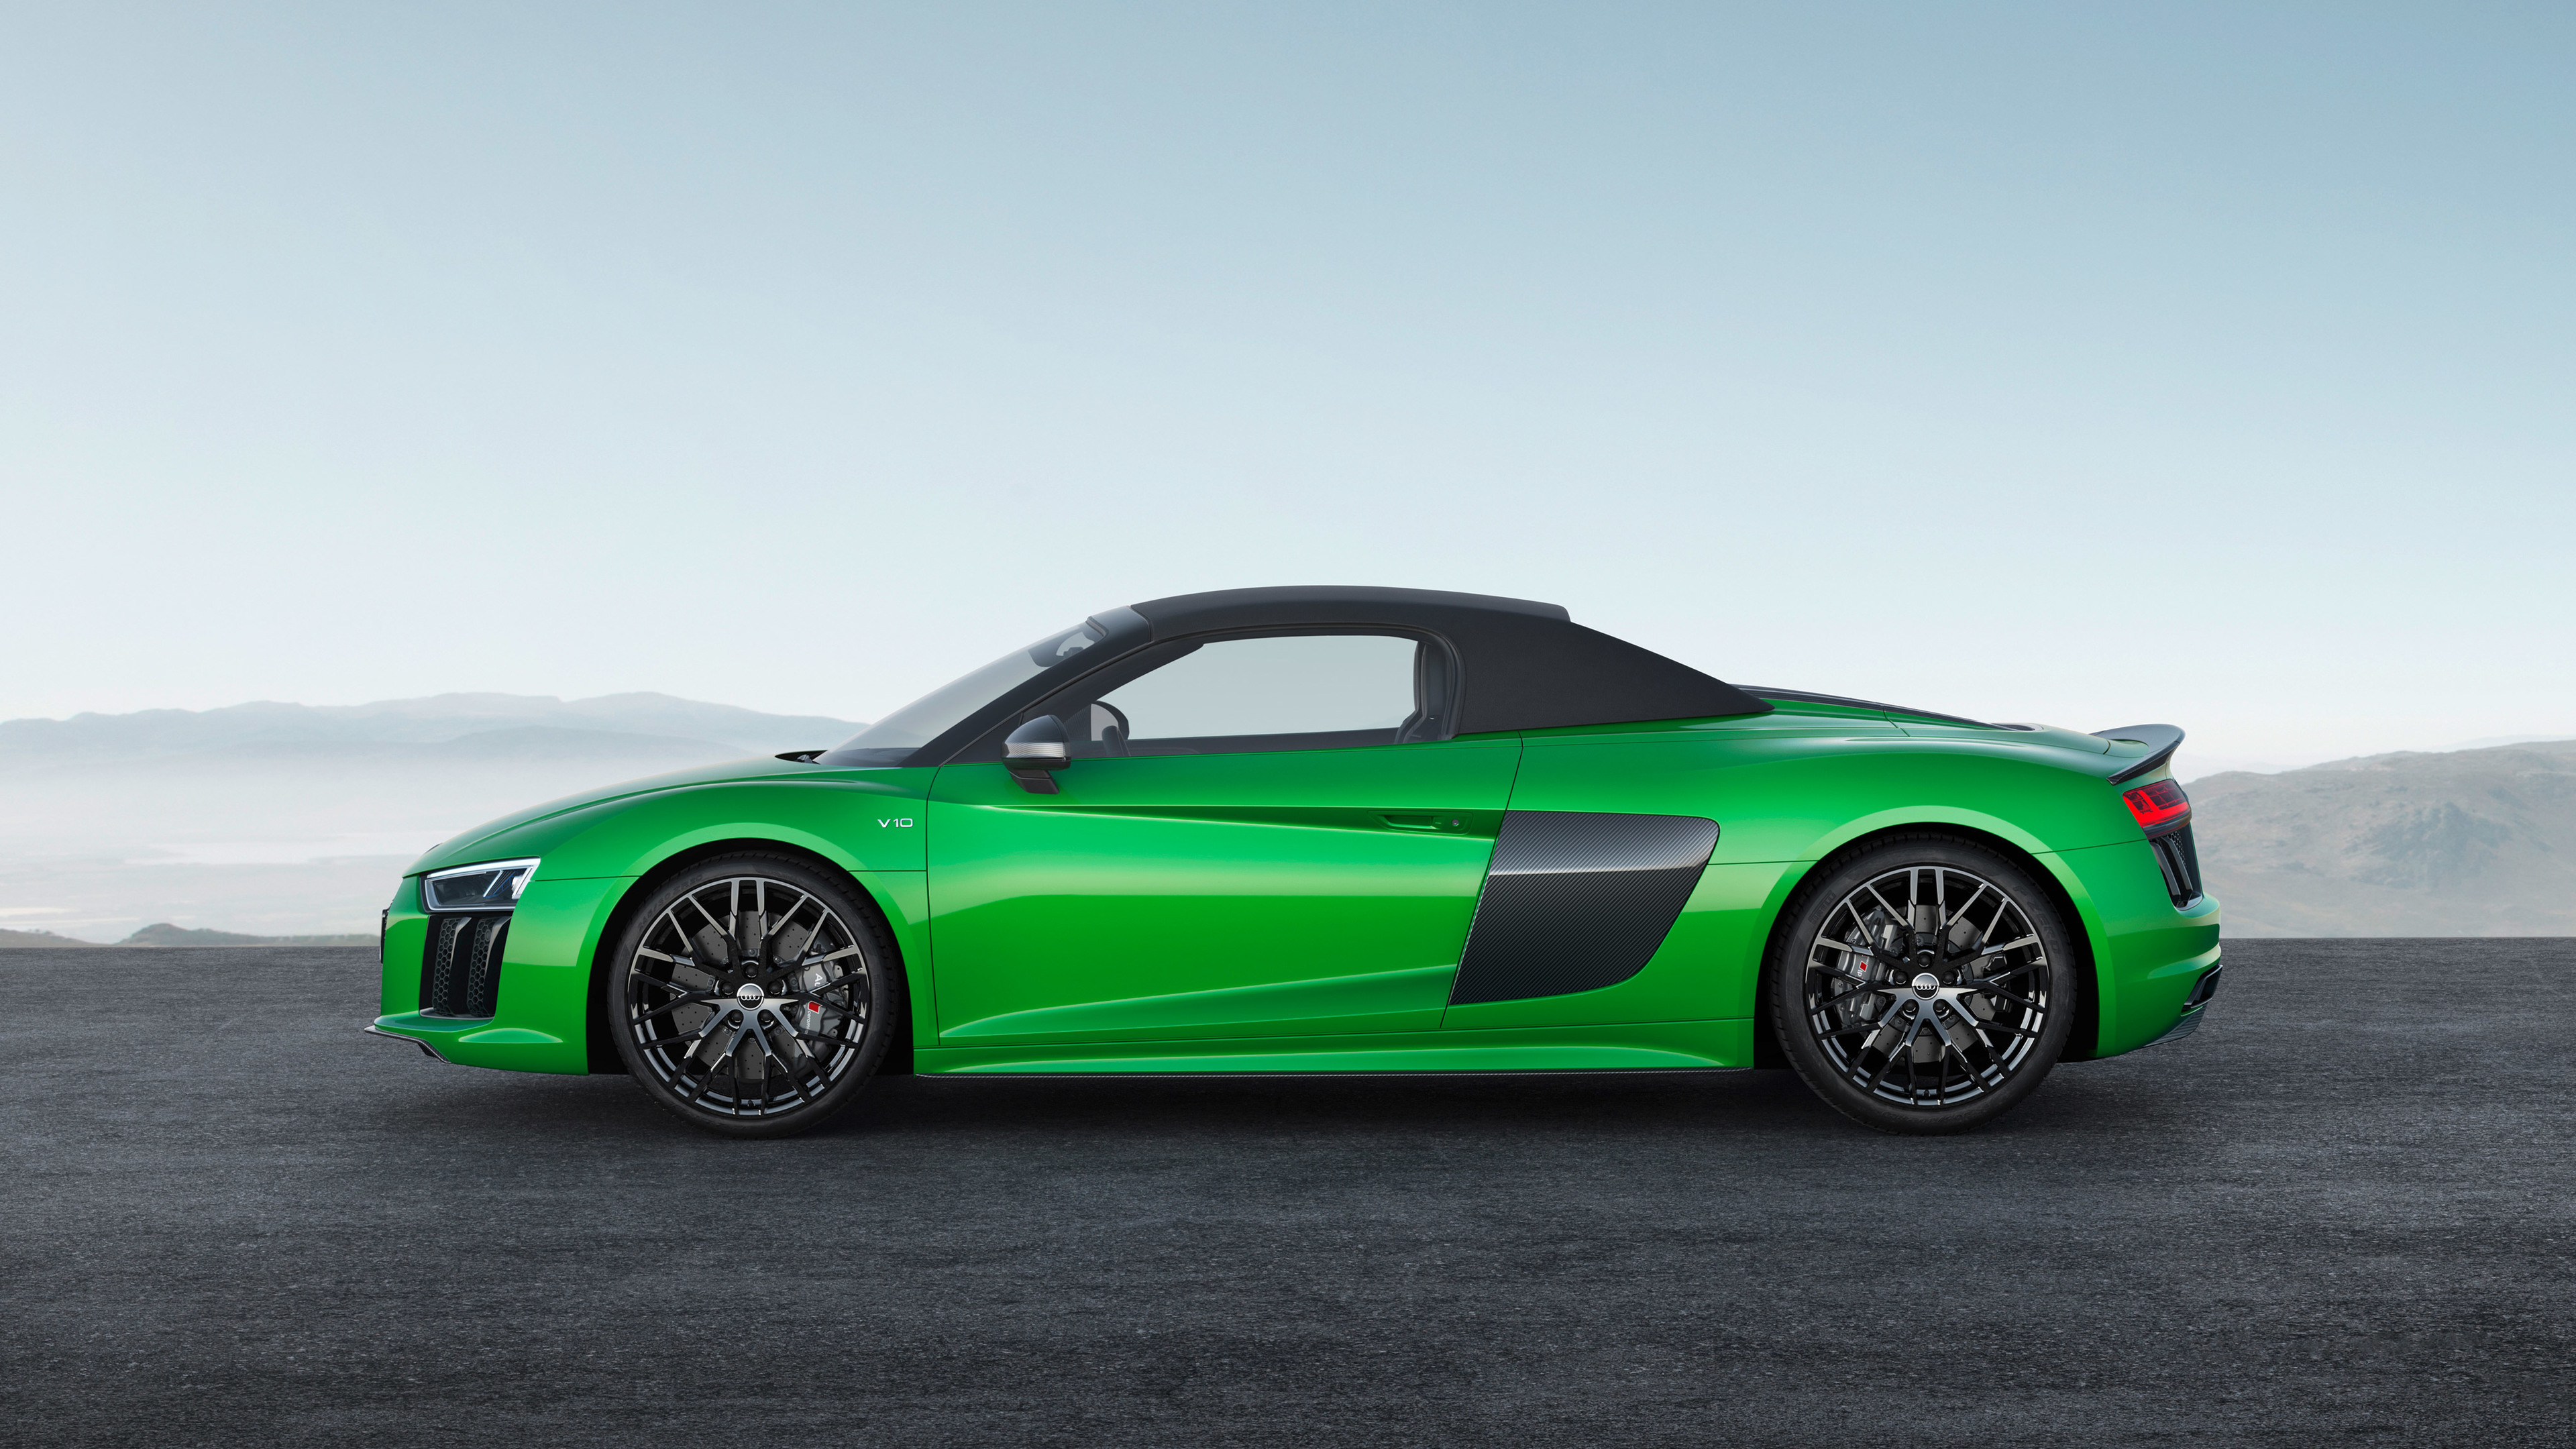 2017 audi r8 spyder v10 plus 4k 1539105483 - 2017 Audi R8 Spyder V10 Plus 4k - hd-wallpapers, cars wallpapers, audi wallpapers, audi r8 wallpapers, audi r8 spyder v10 plus wallpapers, 4k-wallpapers, 2017 cars wallpapers